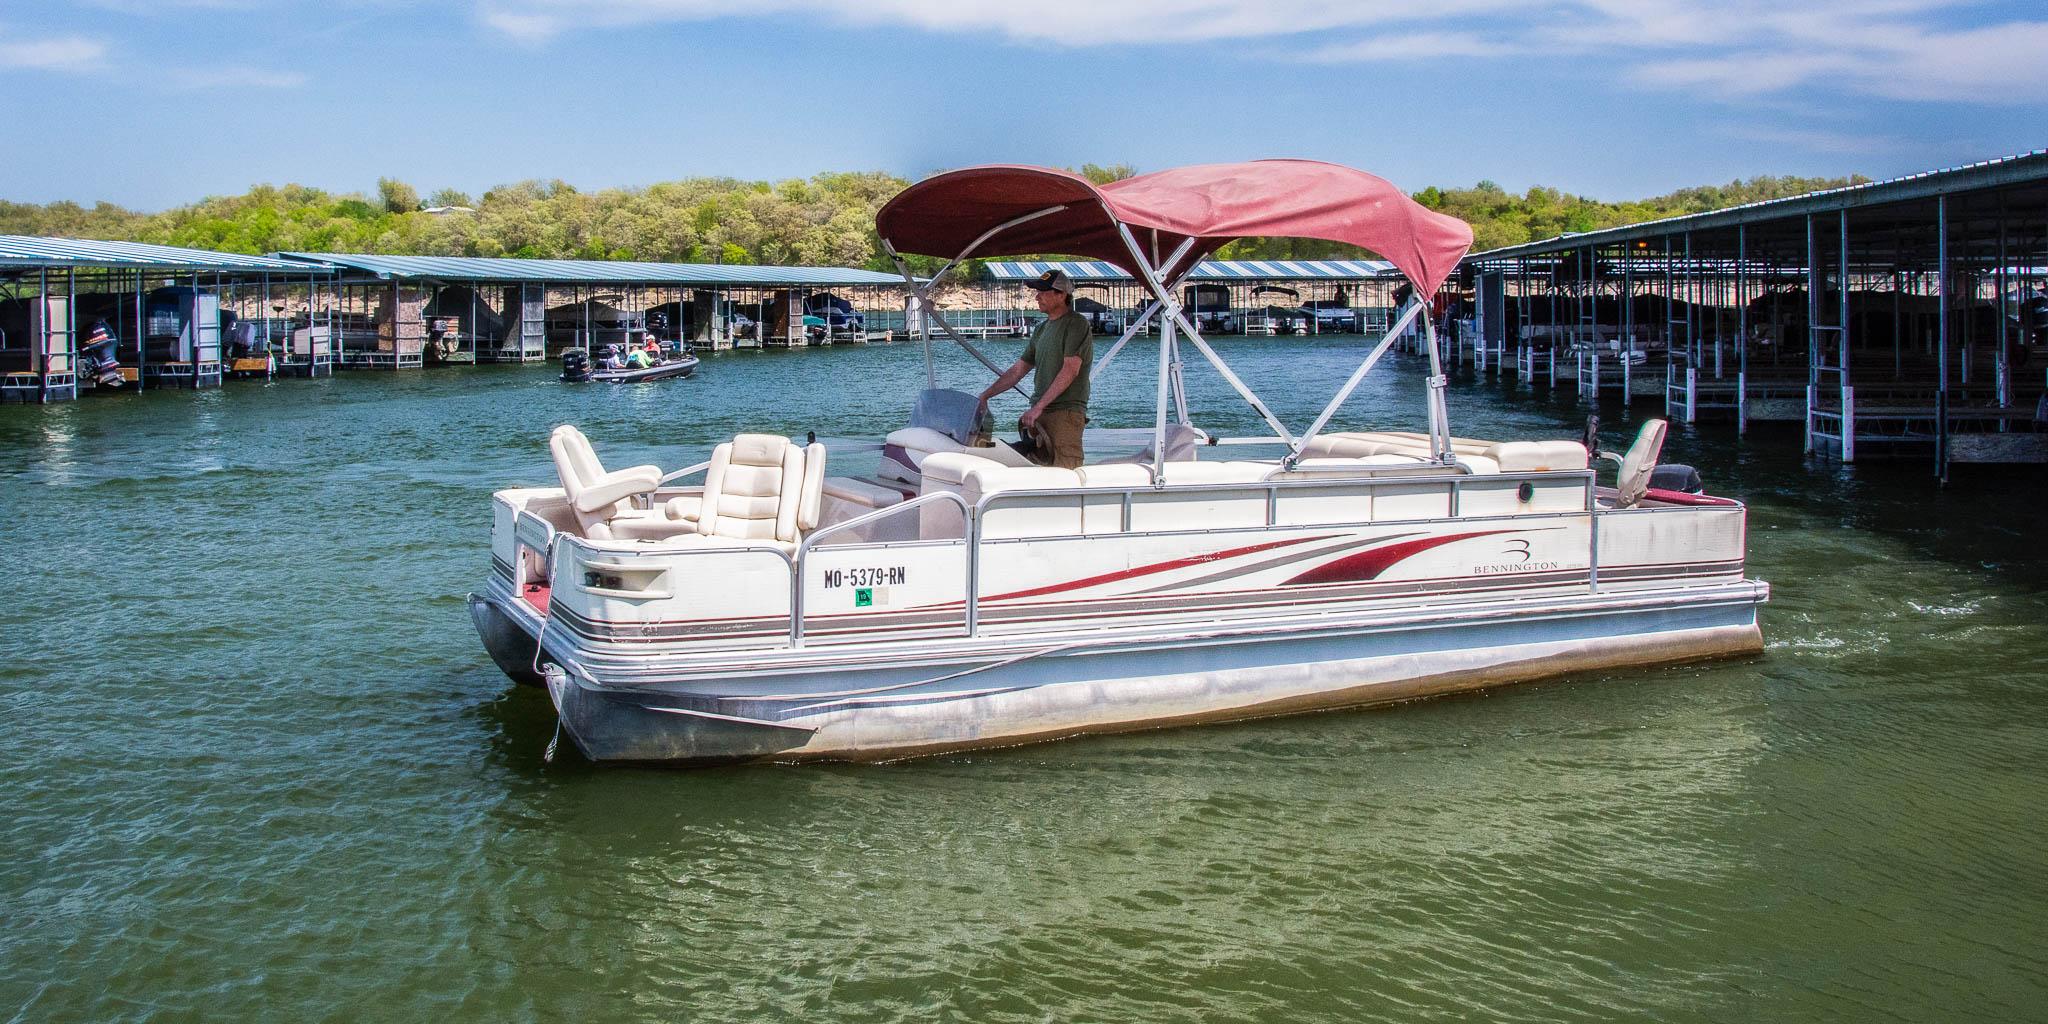 Theodosia Marina-Resort rental boat - 22 ft pontoon